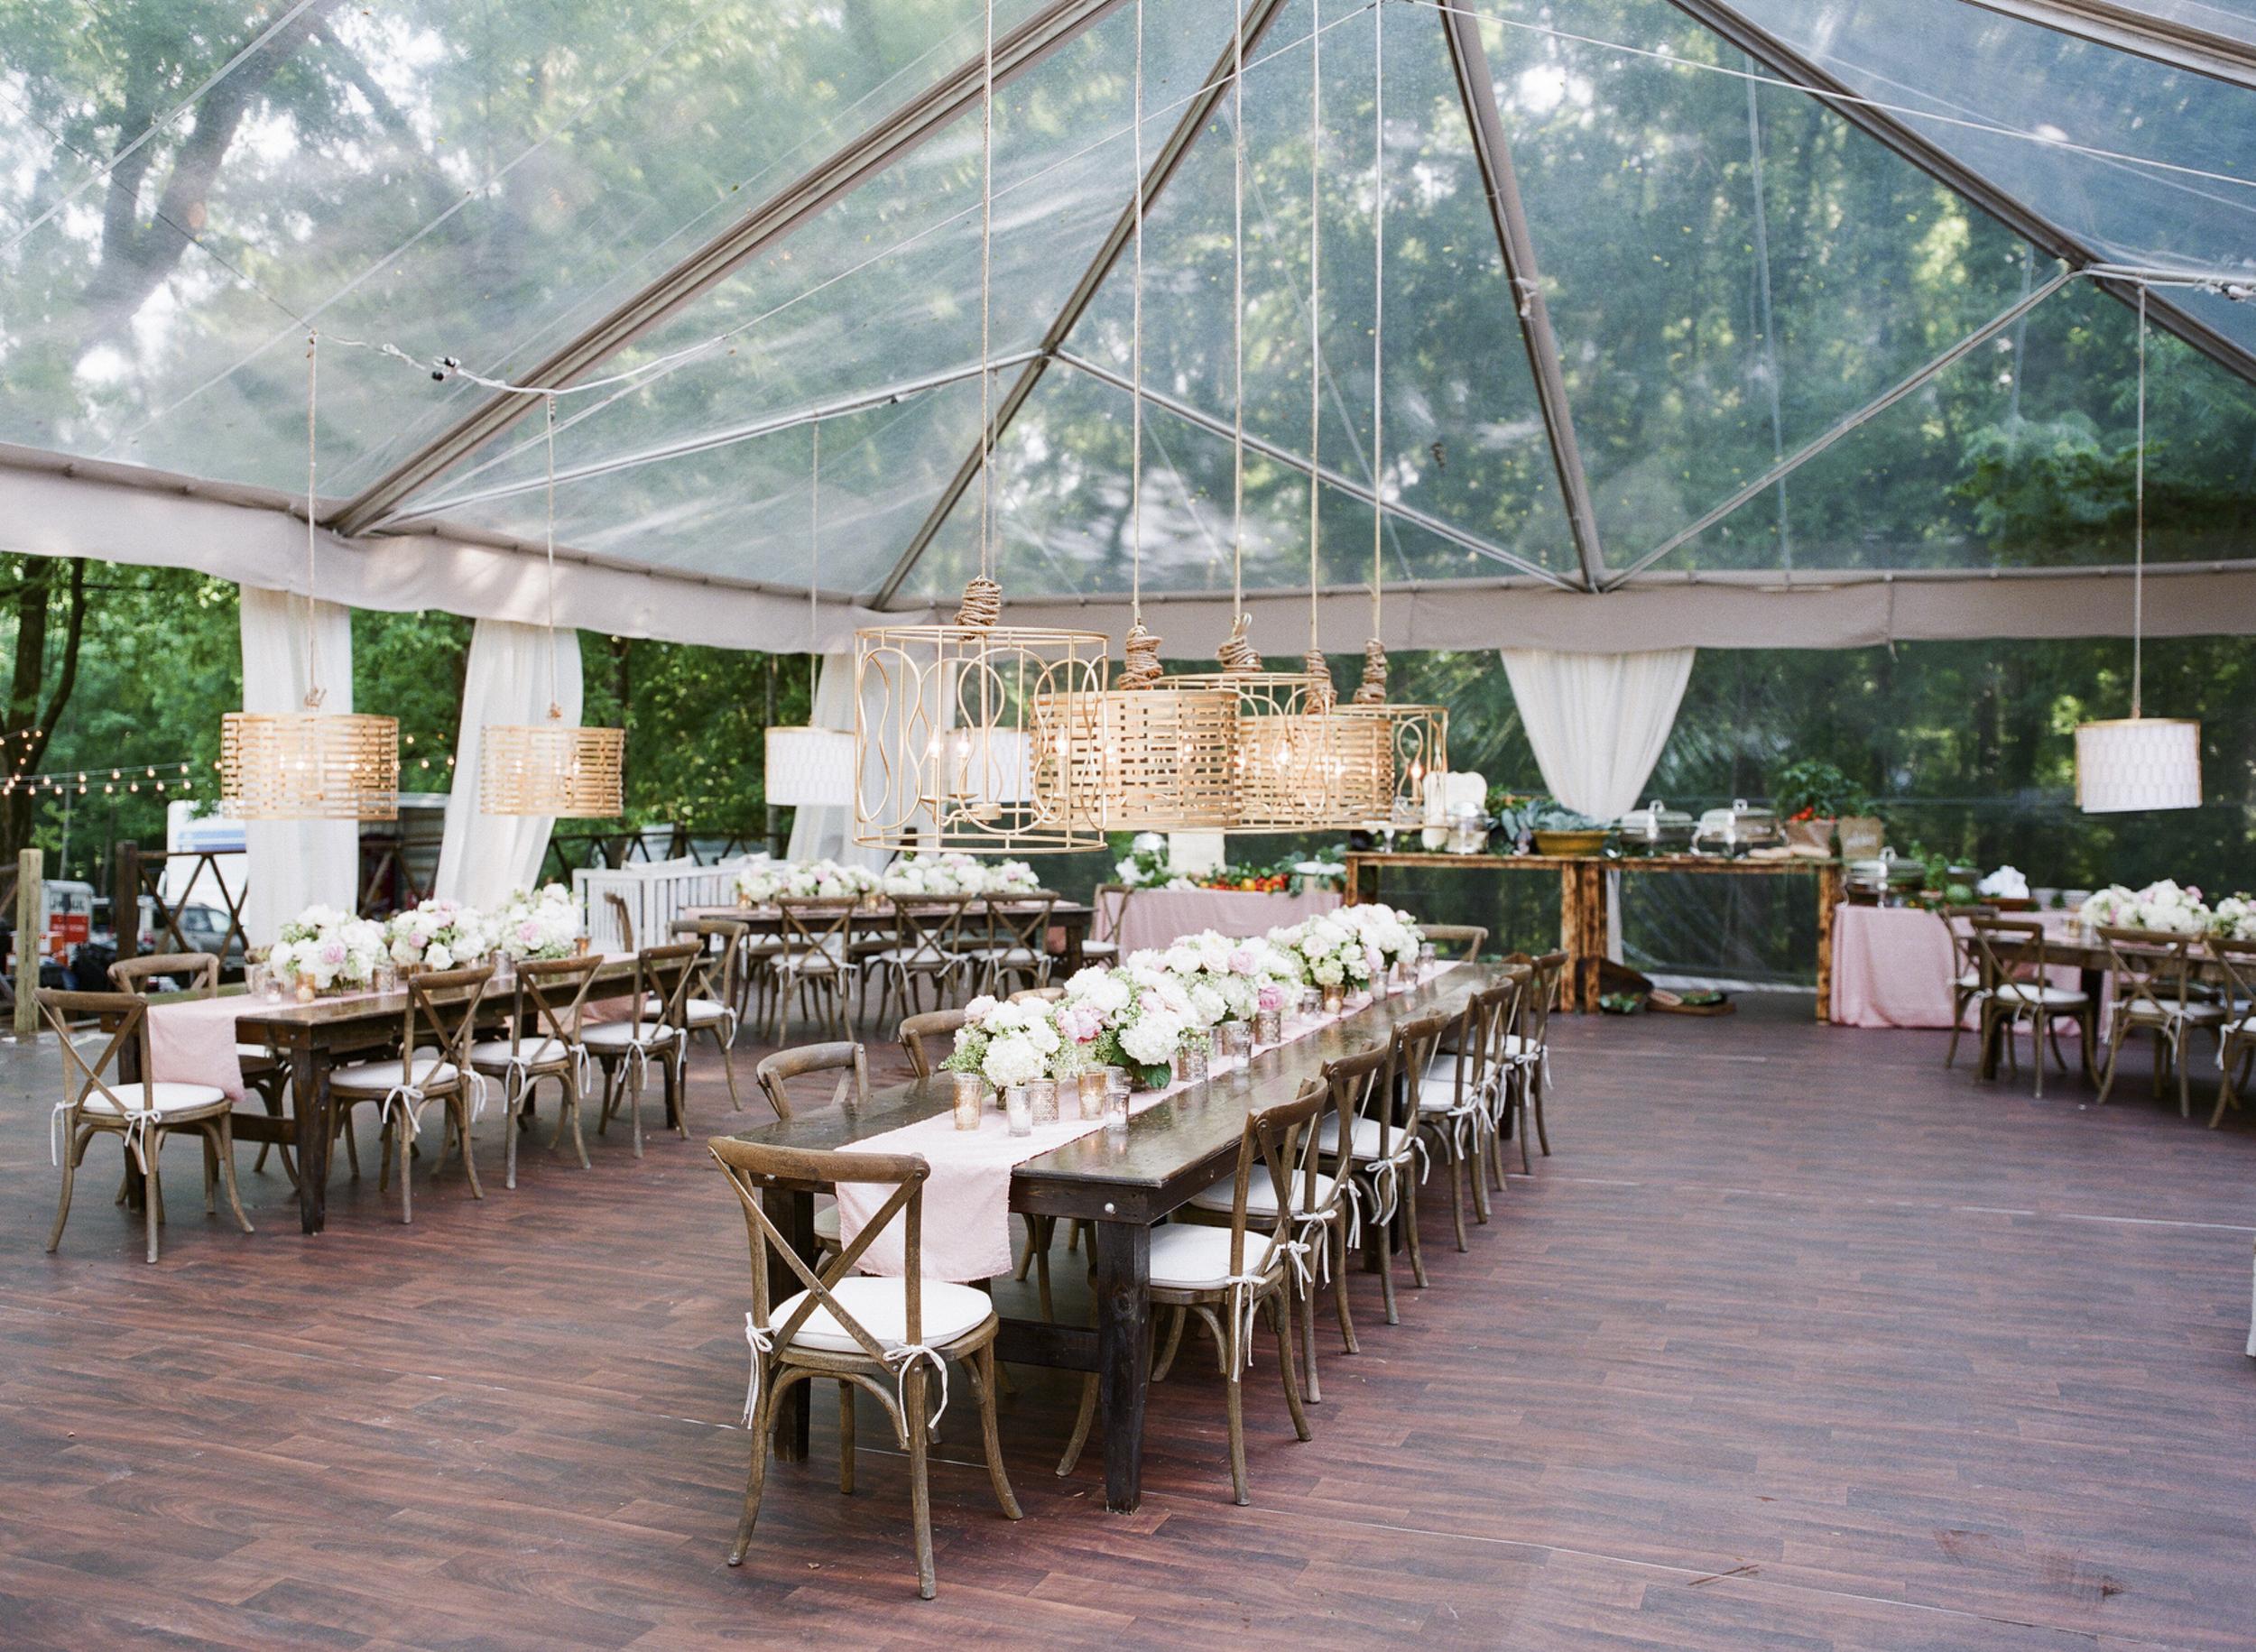 south_carolina_farm_wedding_rustic_chic_surprise_secret_luxe_wedding_bachelorette_emily_maynard_real_weddings-7.jpg